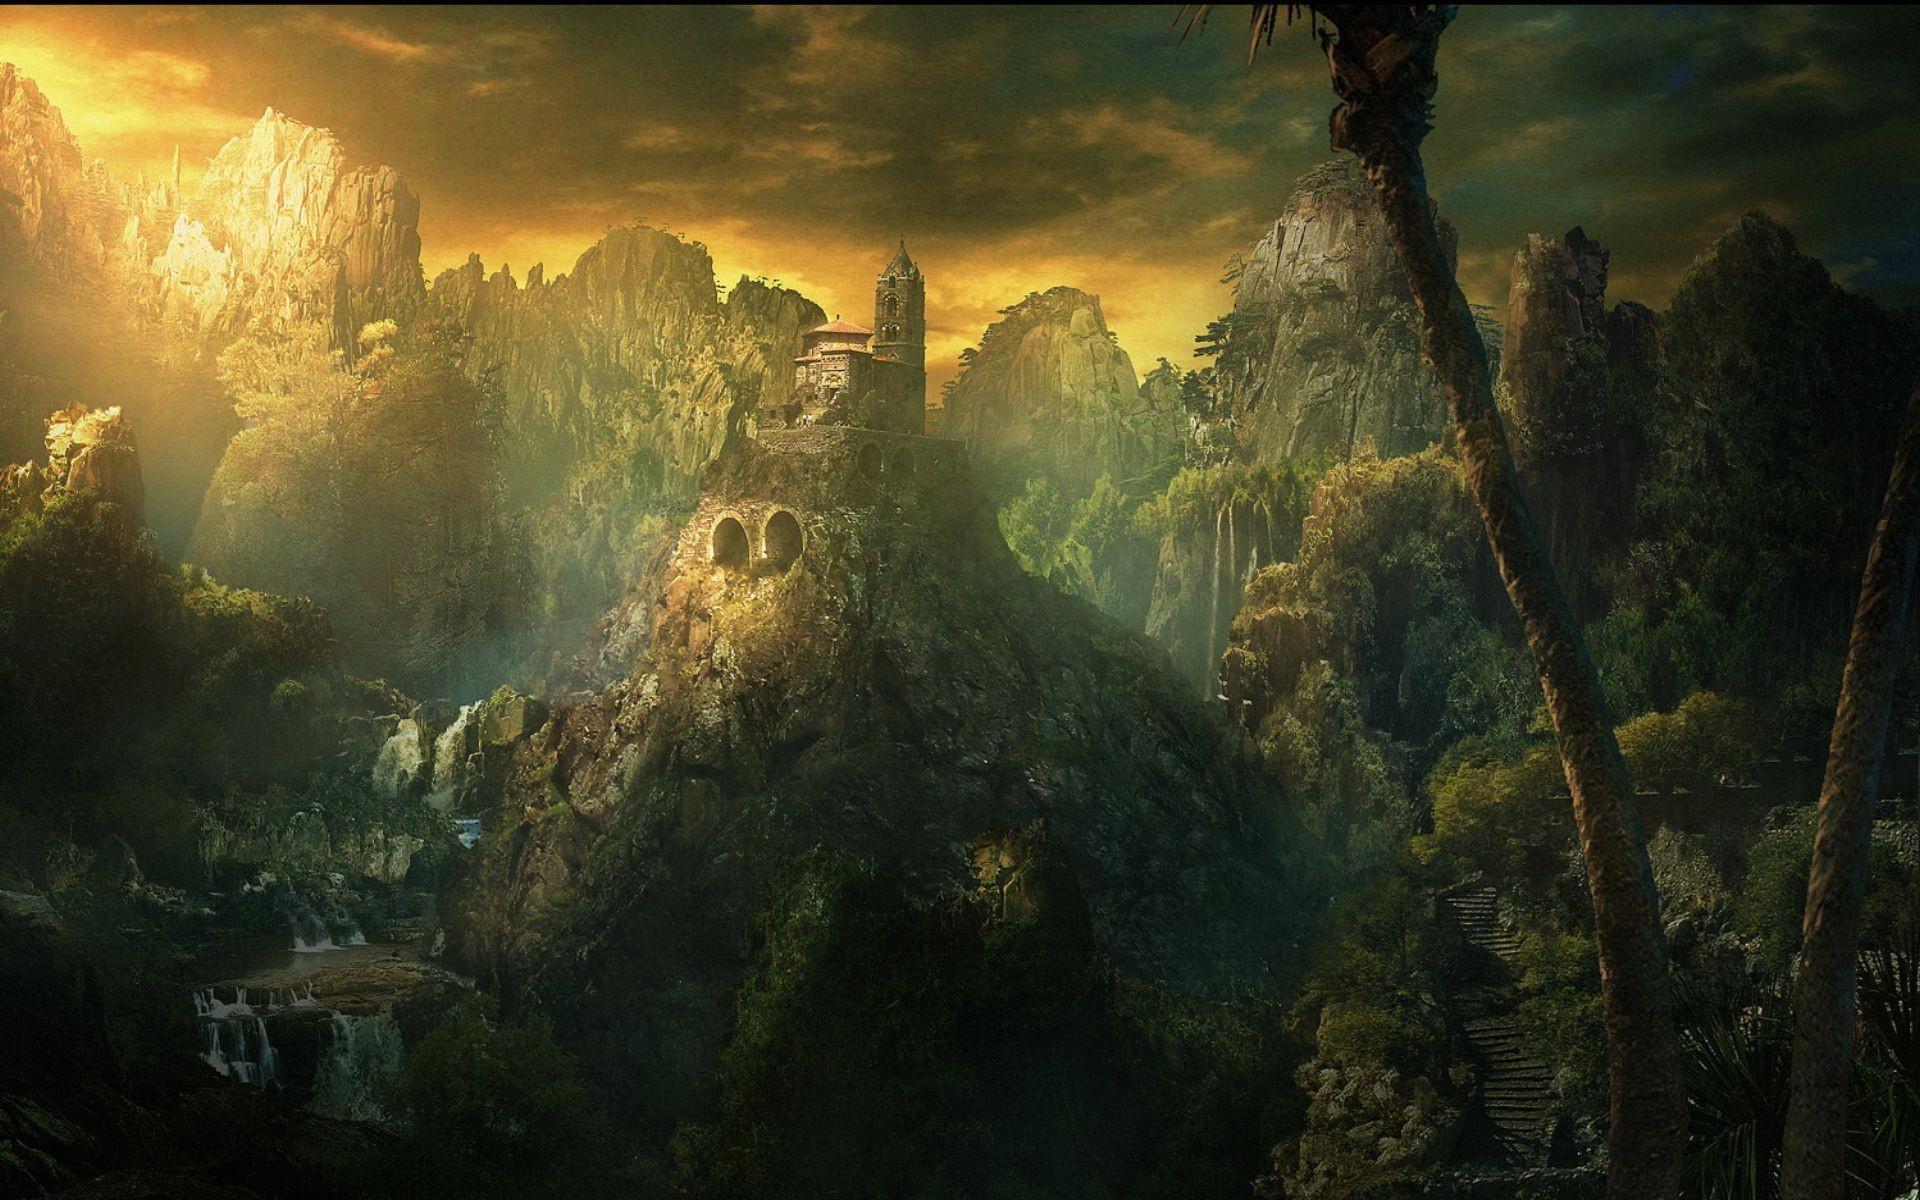 Dark fantasy wallpaper download free cool wallpapers - Fantasy wallpaper dark ...